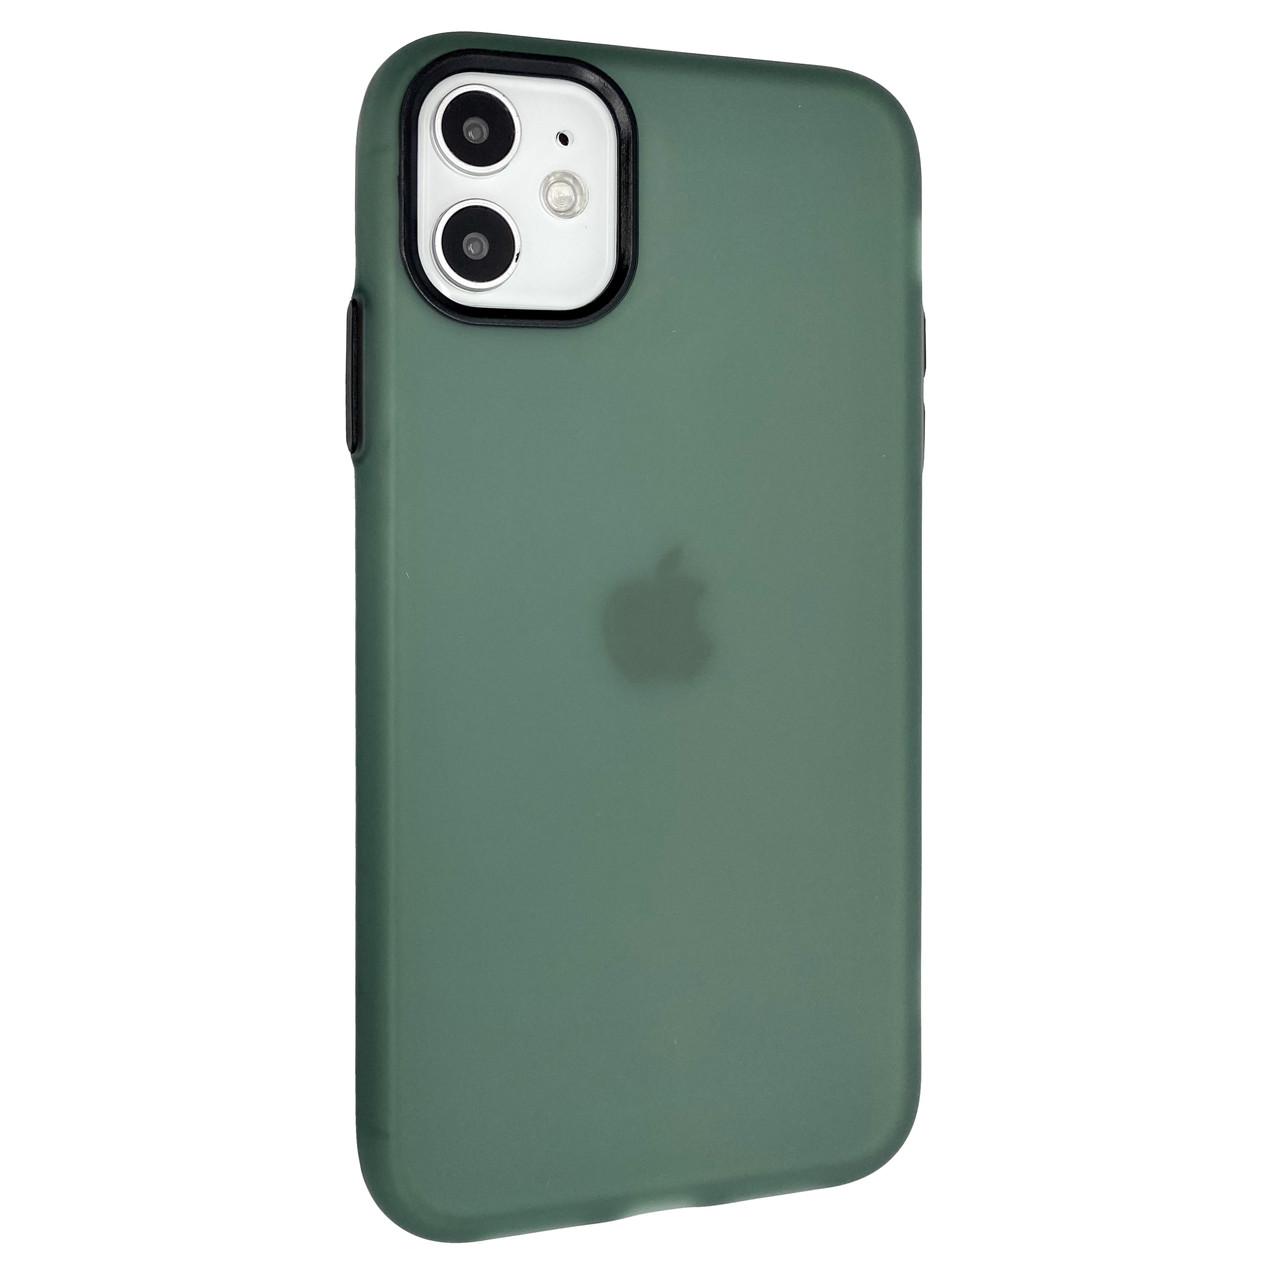 Чехол-накладка DK Silicone Matting Silk для Apple iPhone 11 (green / black)